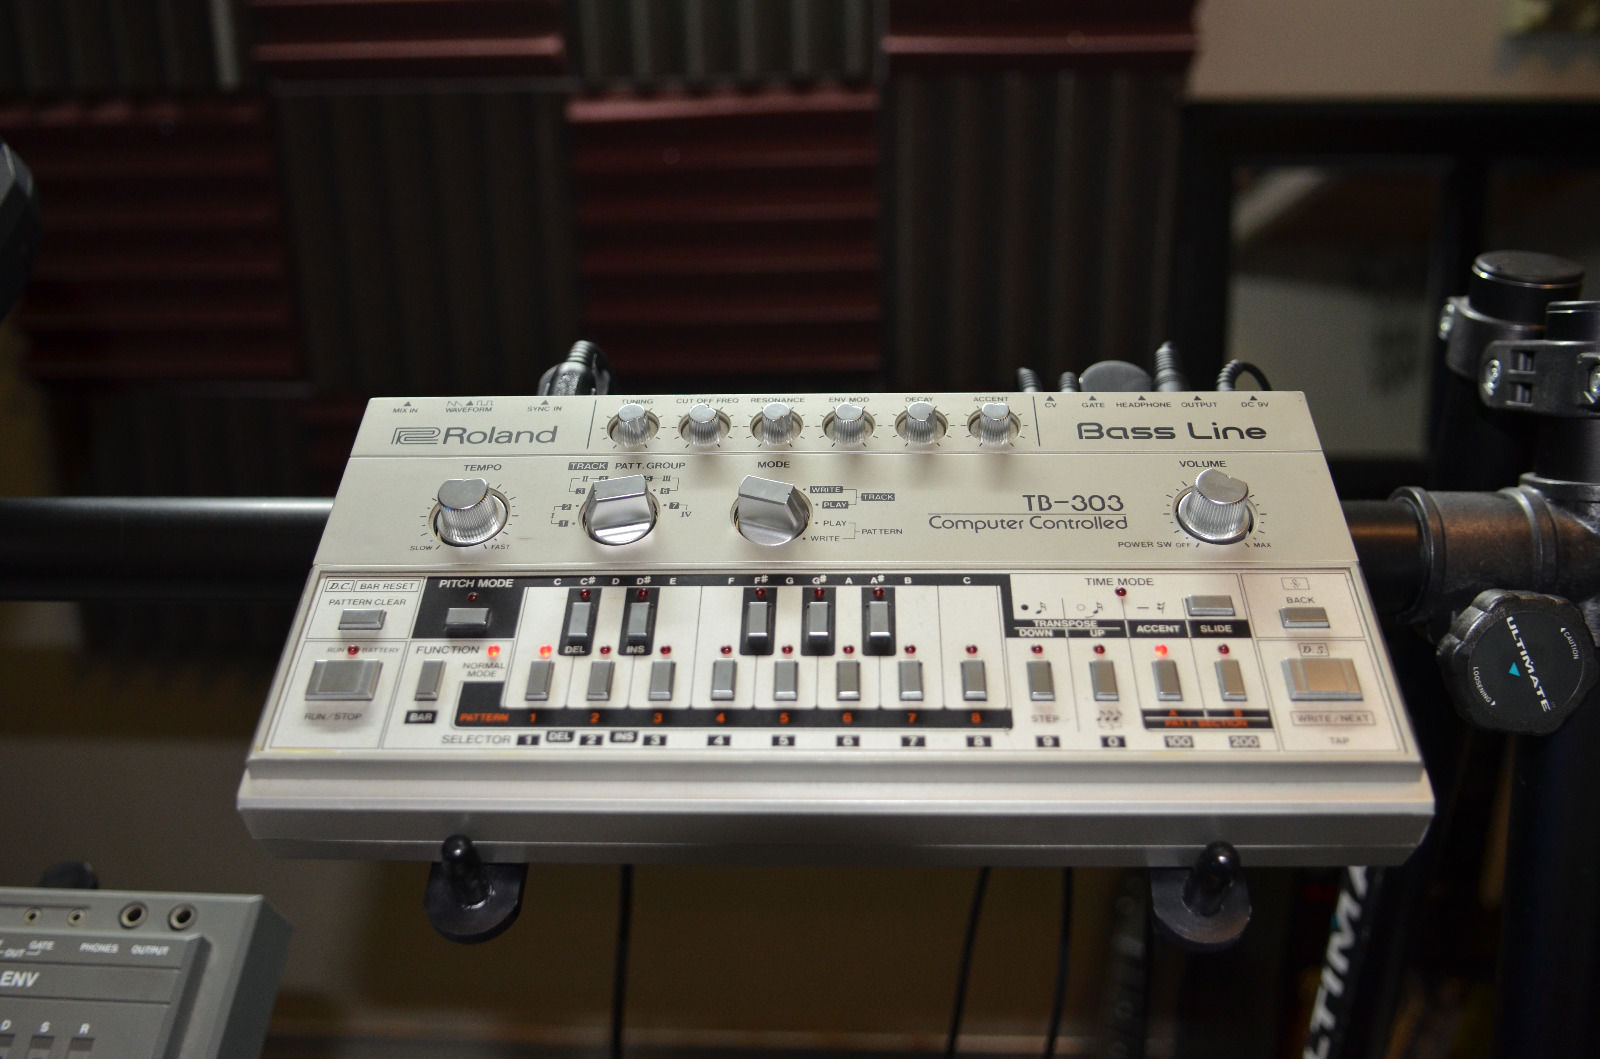 Matrixsynth Saturday April 26 2014 Diy Voltagecontrolled Amplifier Hackme Roland Tb 303 Bassline Synthesizer Sn 130800